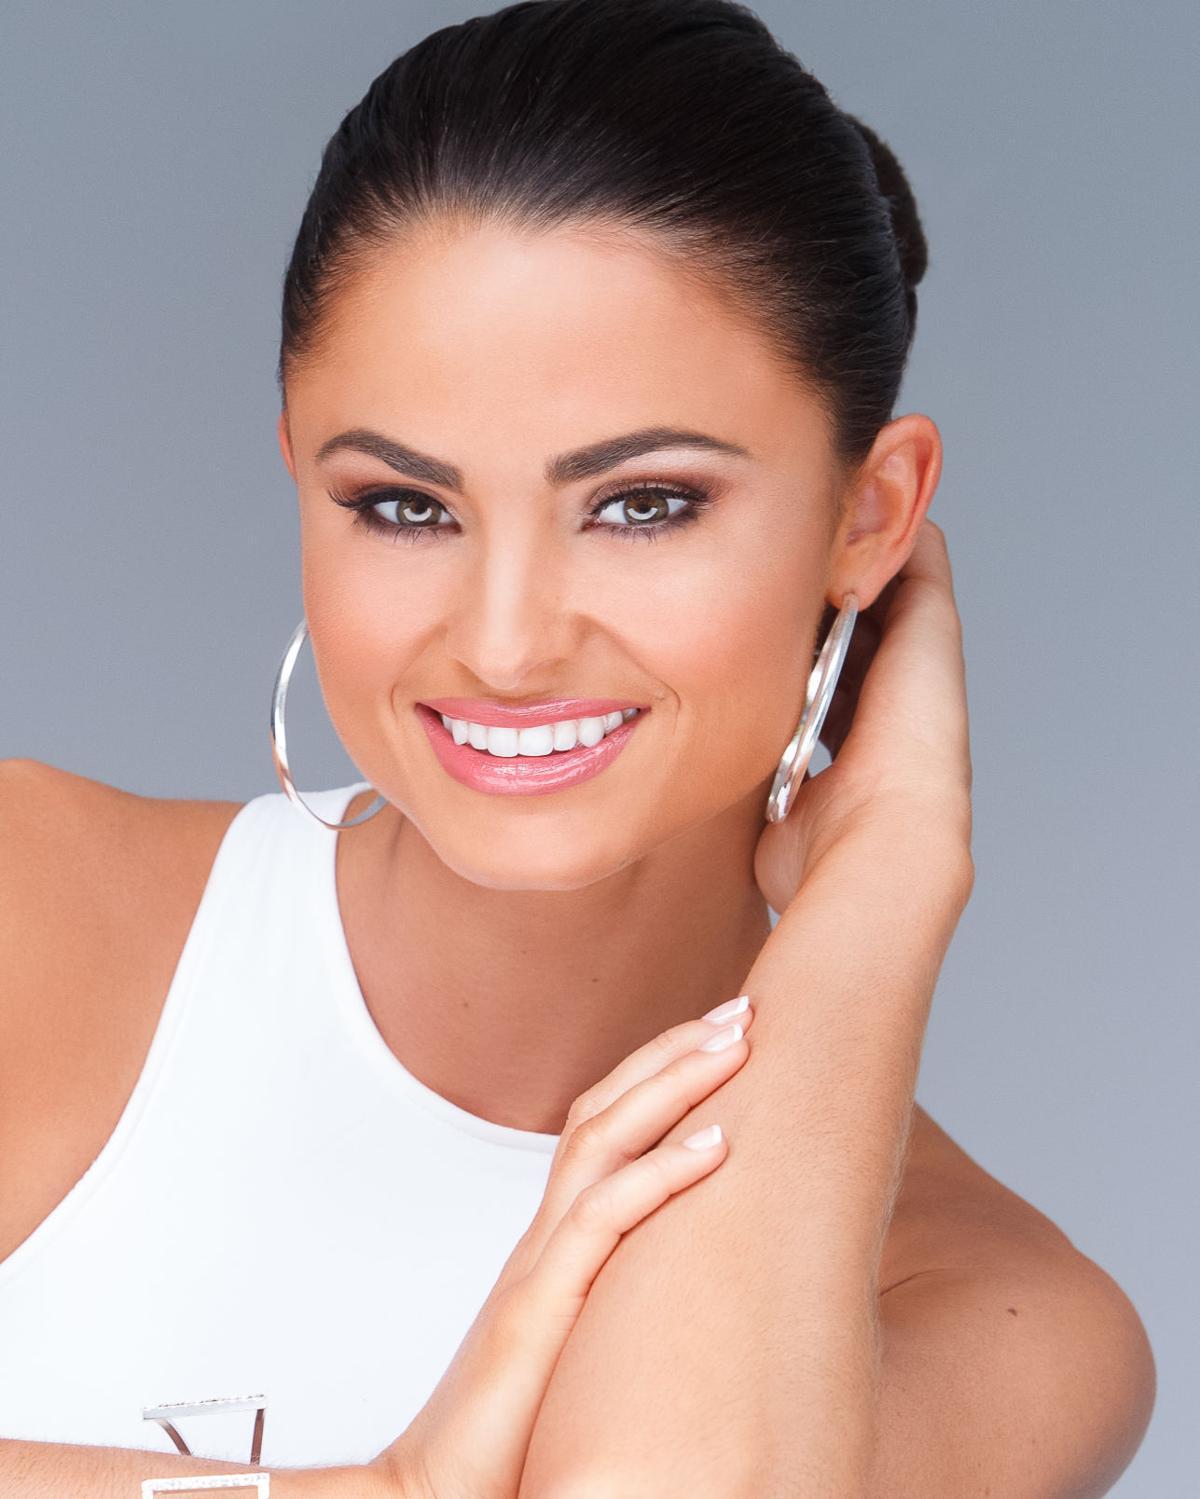 Miss Georgia 2017 Alyssa Beasley